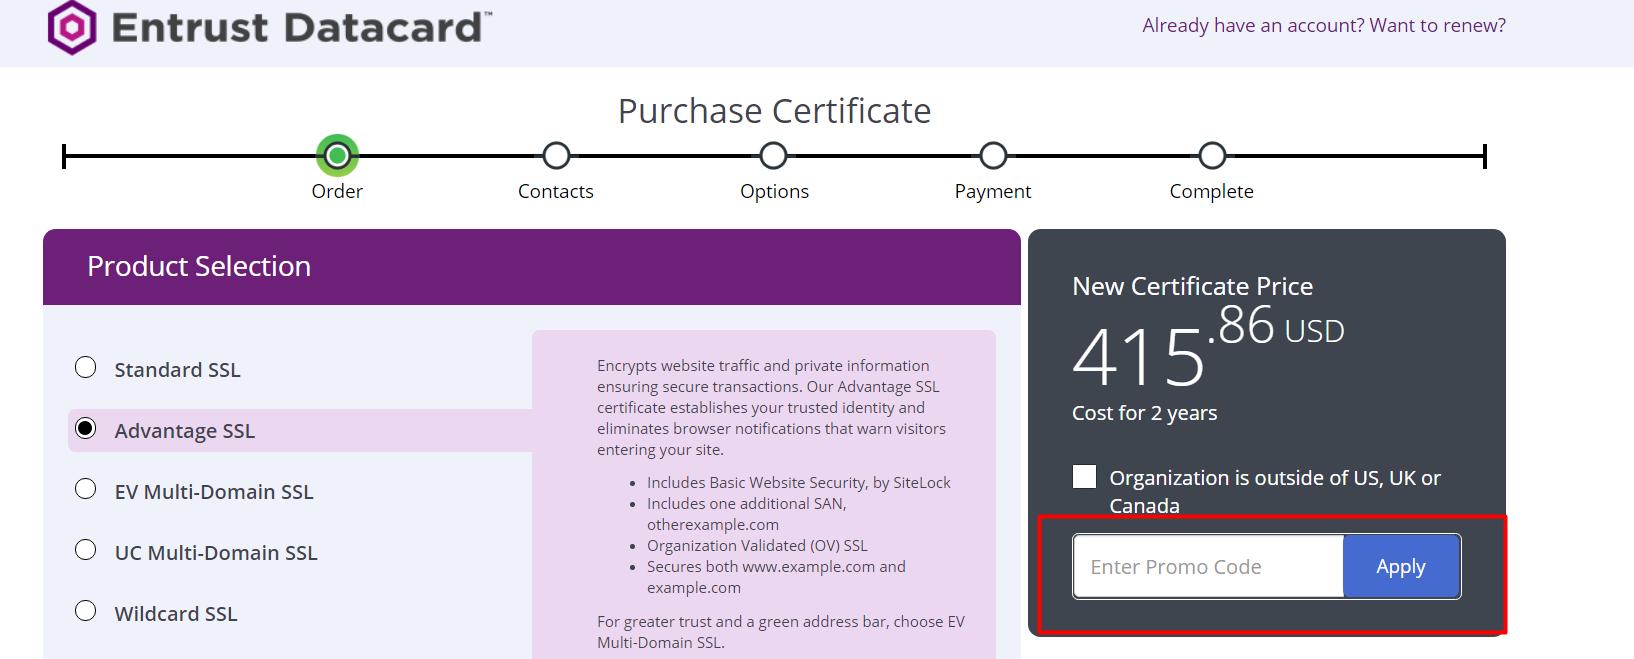 How do I use my Entrust Datacard discount code?